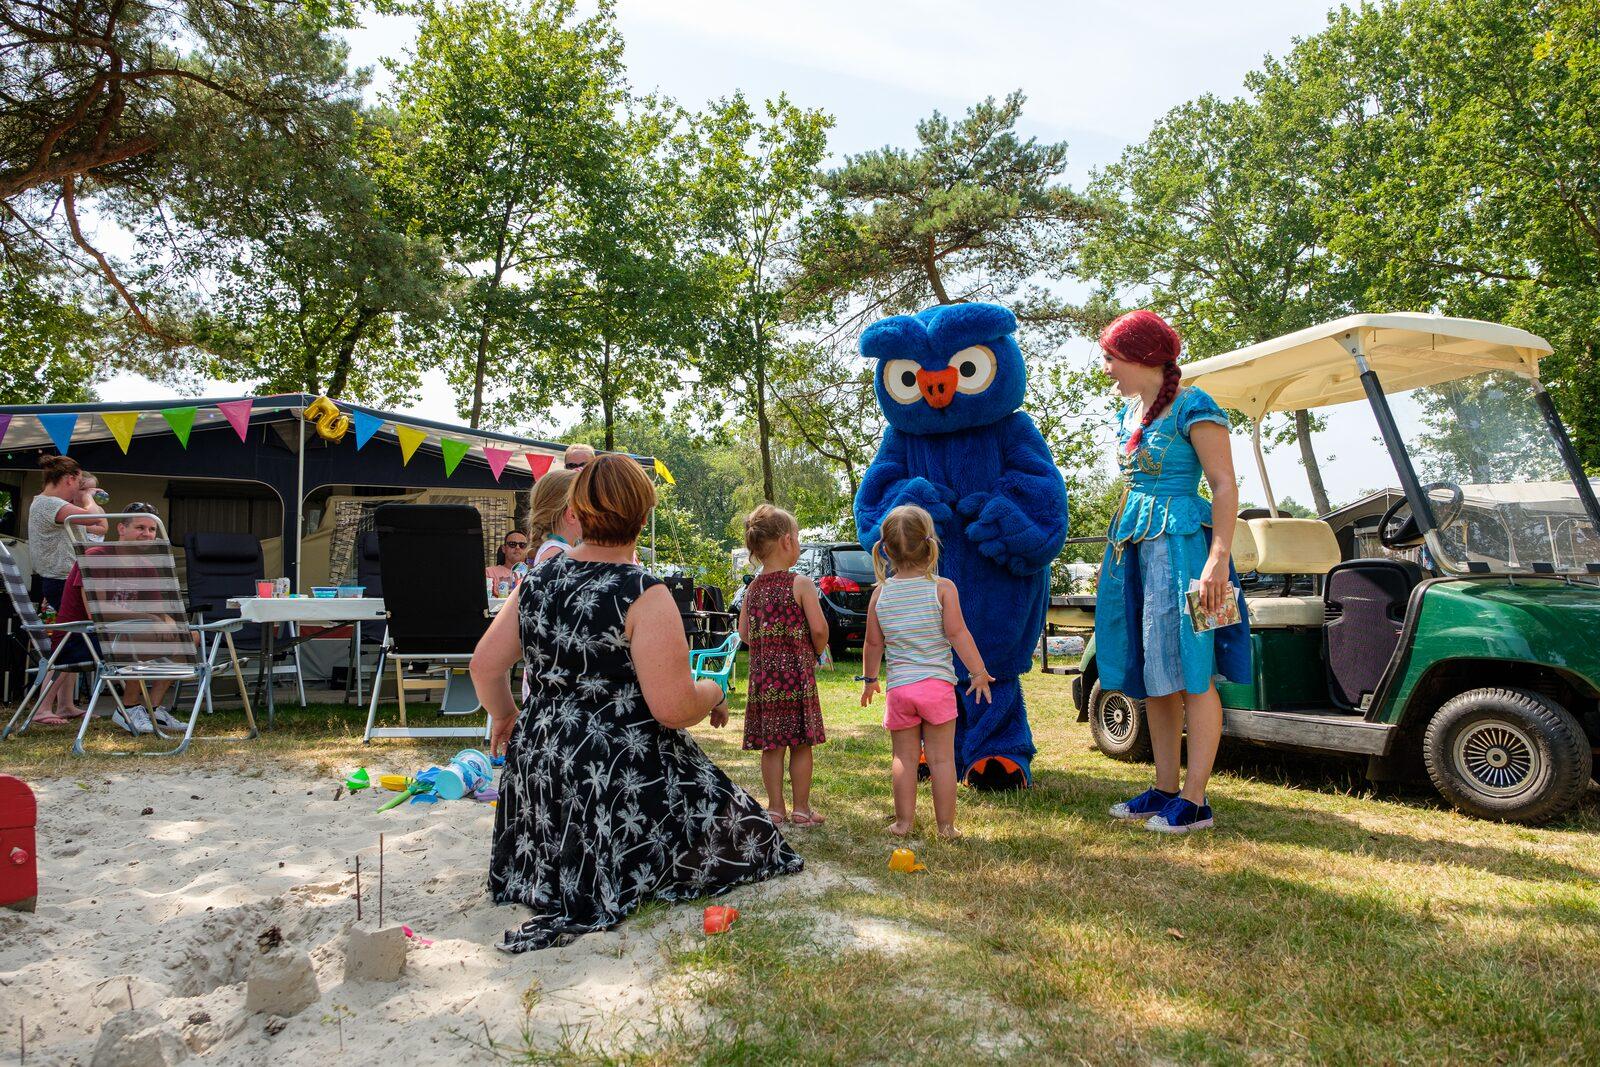 Children's campsite in The Netherlands